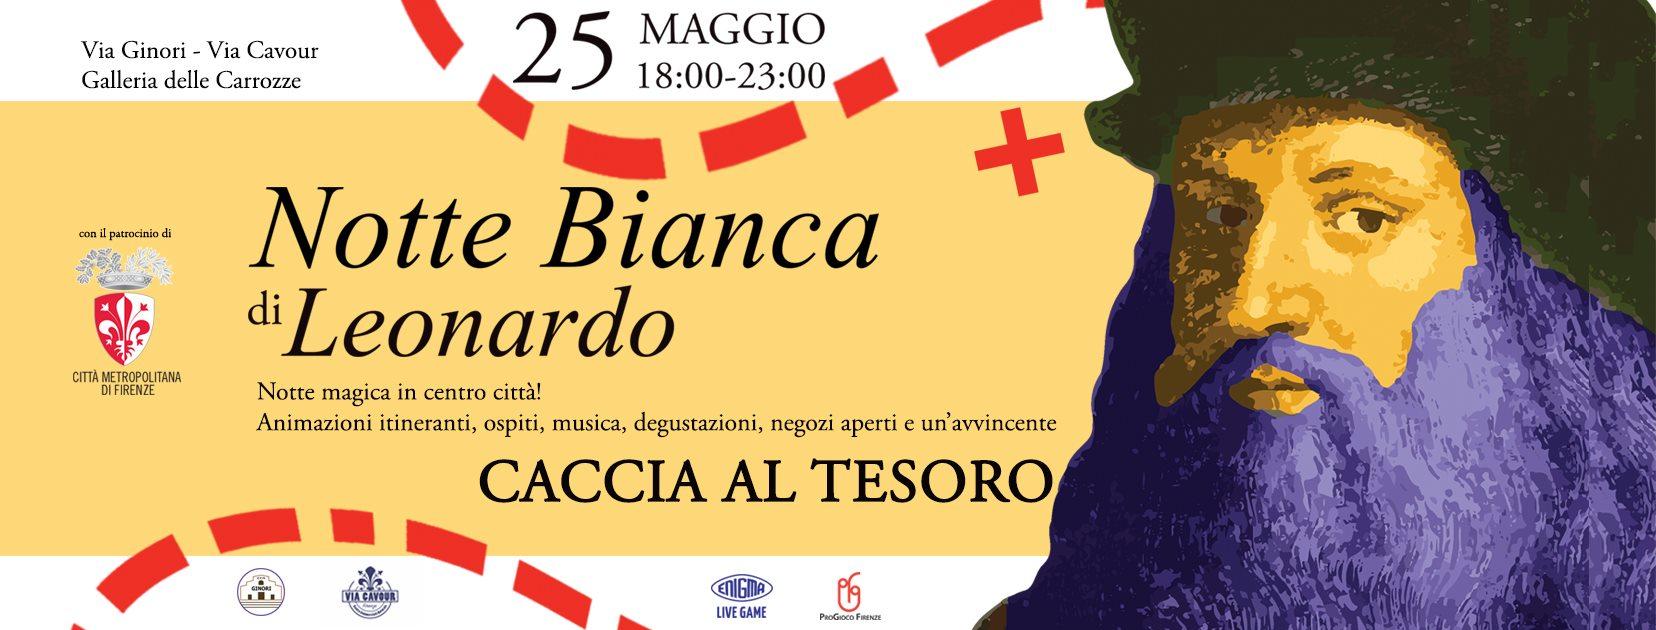 Notte Bianca di Leonardo – Caccia al tesoro – Firenze